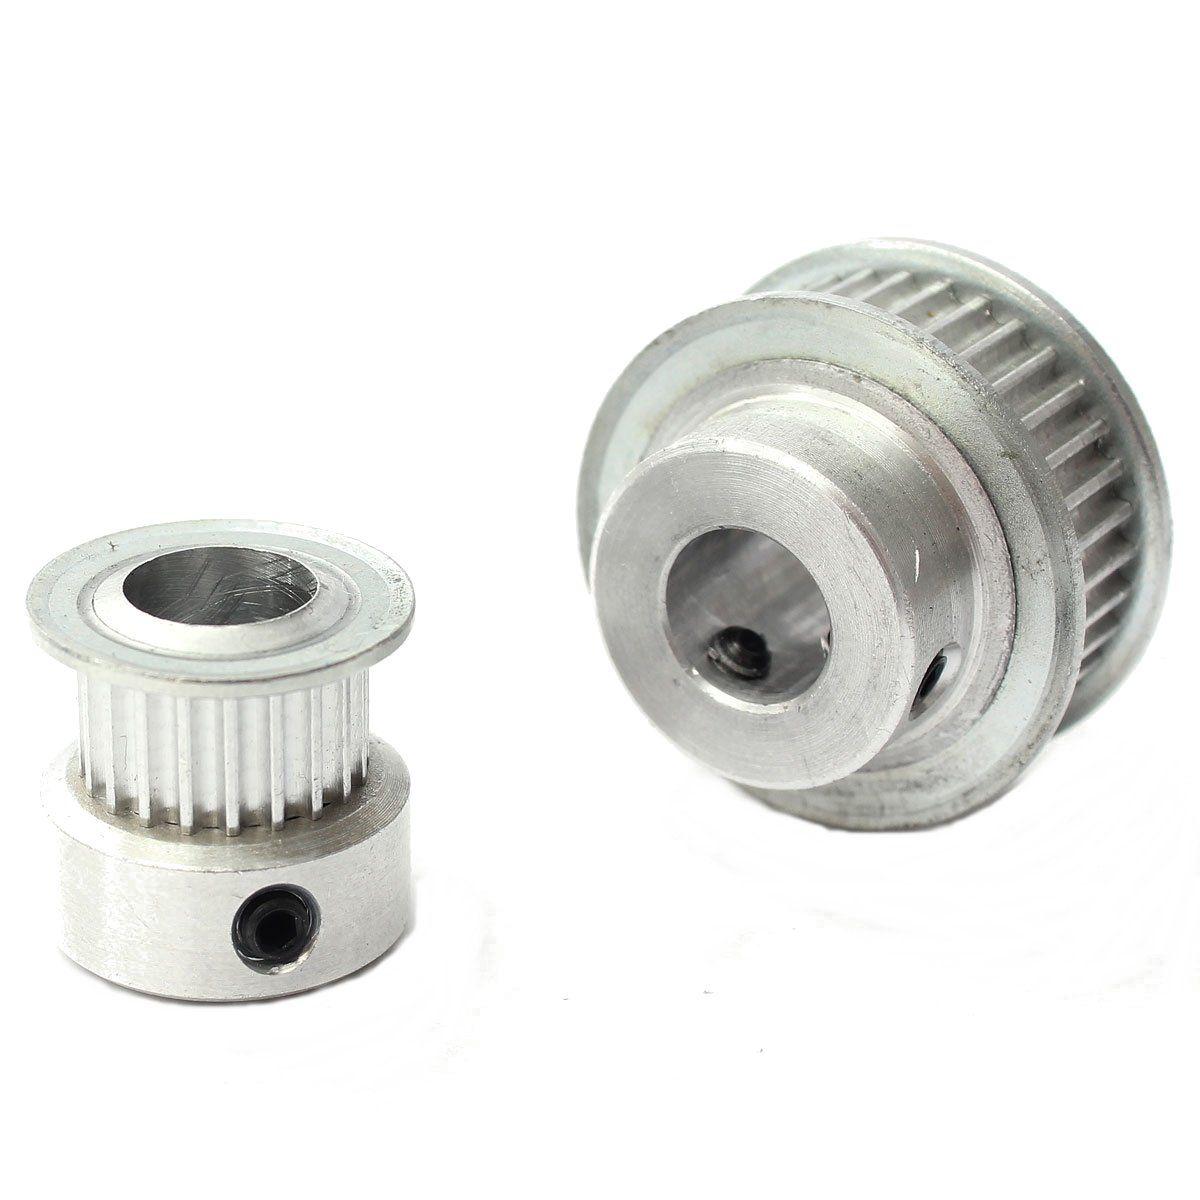 20 36t 8mm Bore 6mm Width Gt2 Aluminum Timing Pulley For 3d Printer 40 Teeth 10mm Belt